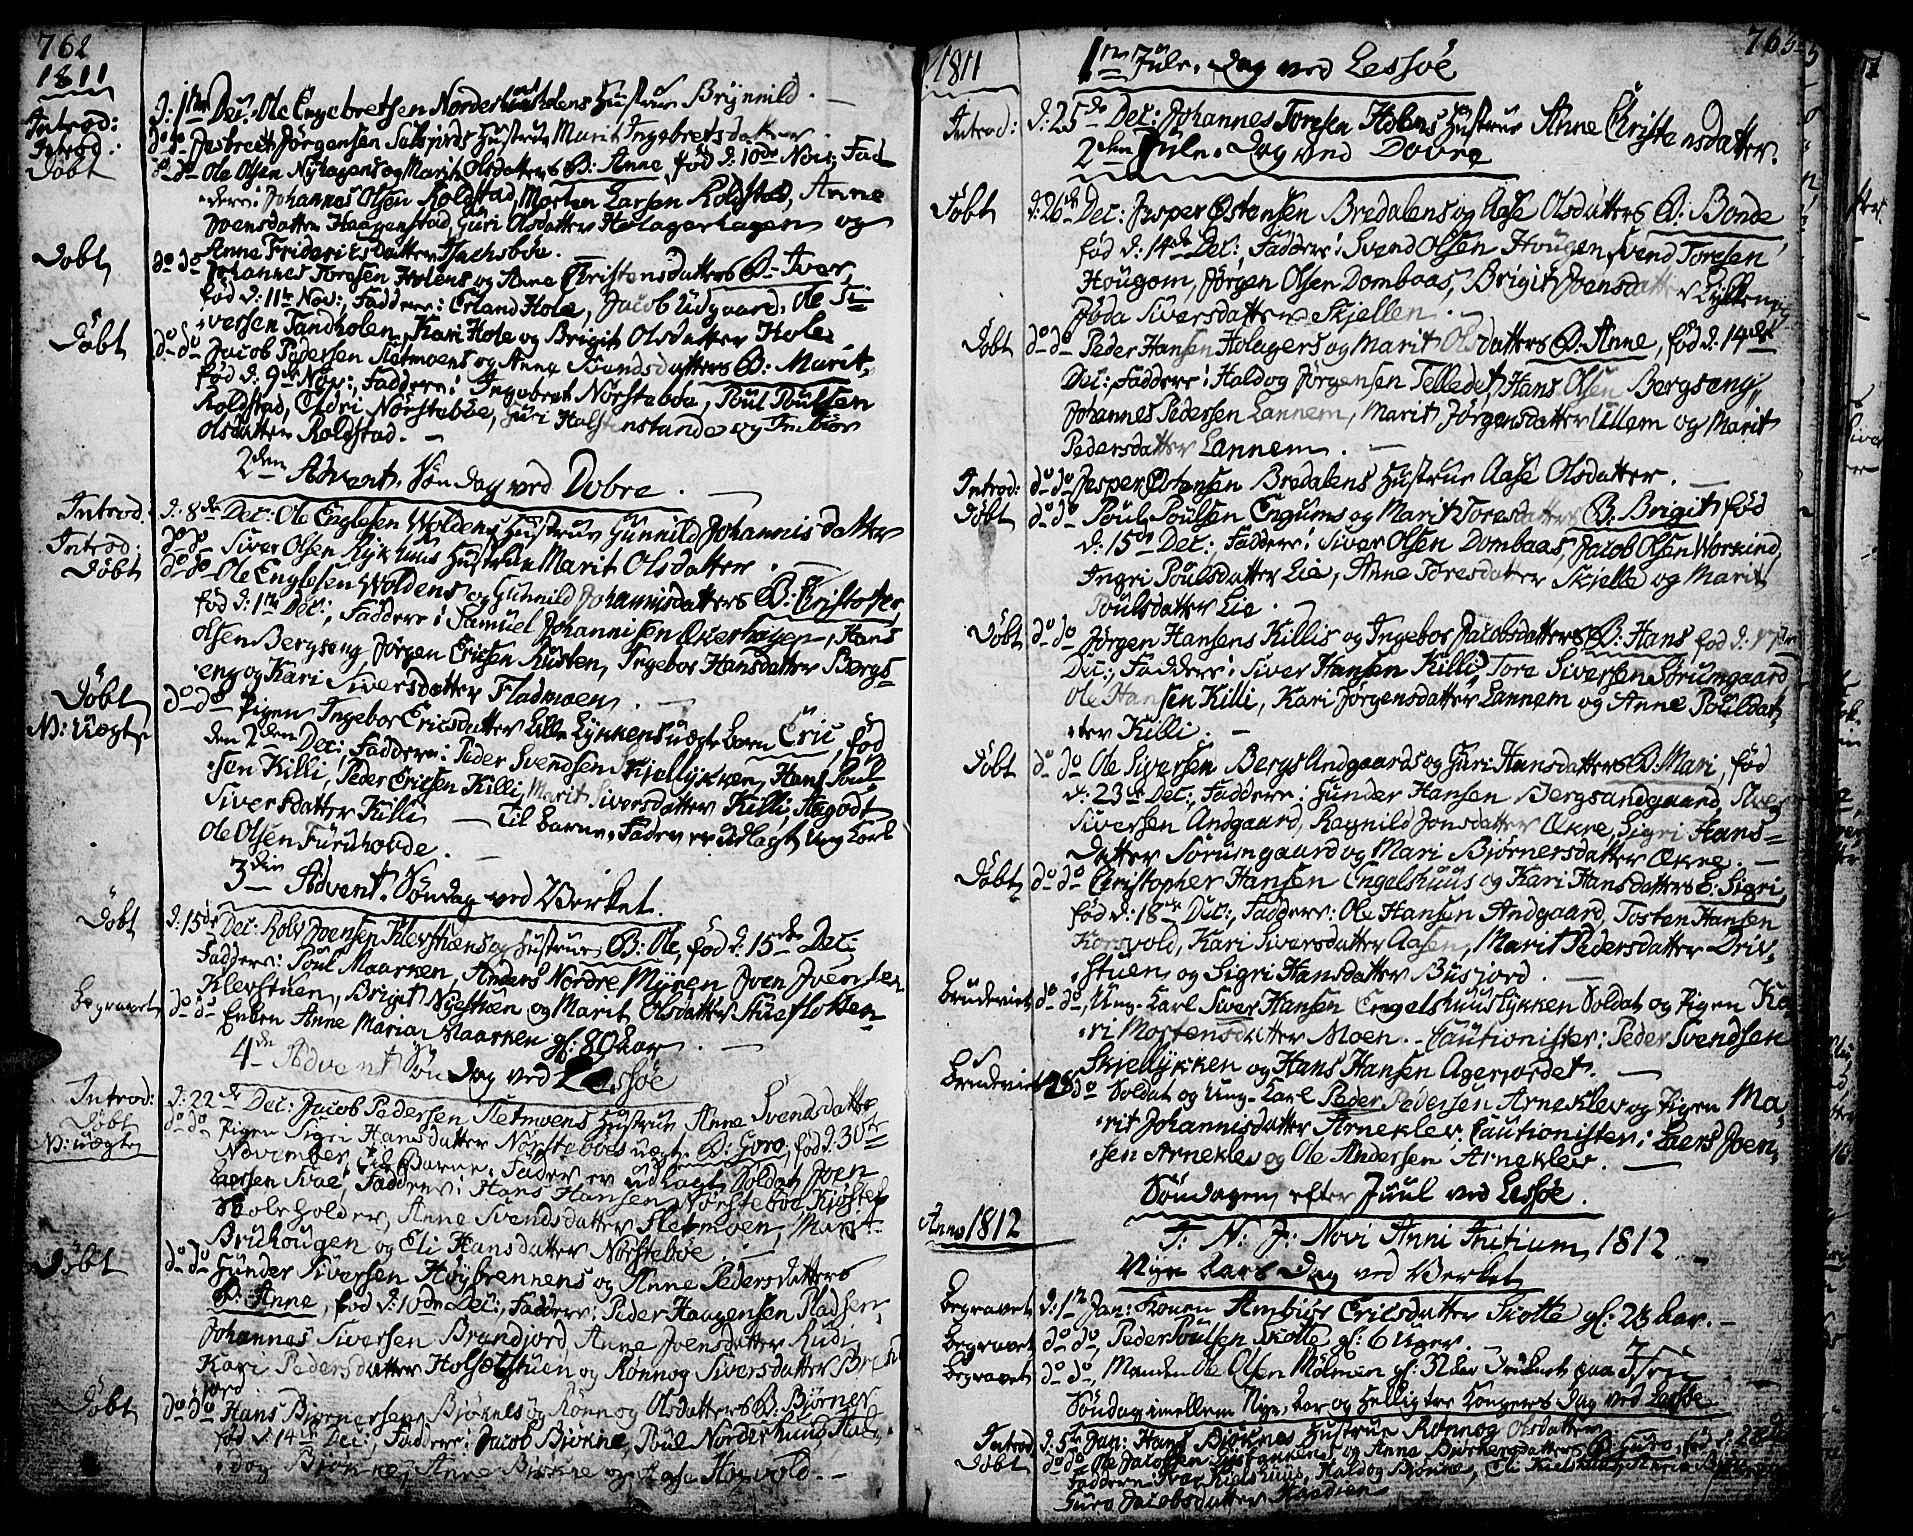 SAH, Lesja prestekontor, Ministerialbok nr. 3, 1777-1819, s. 762-763